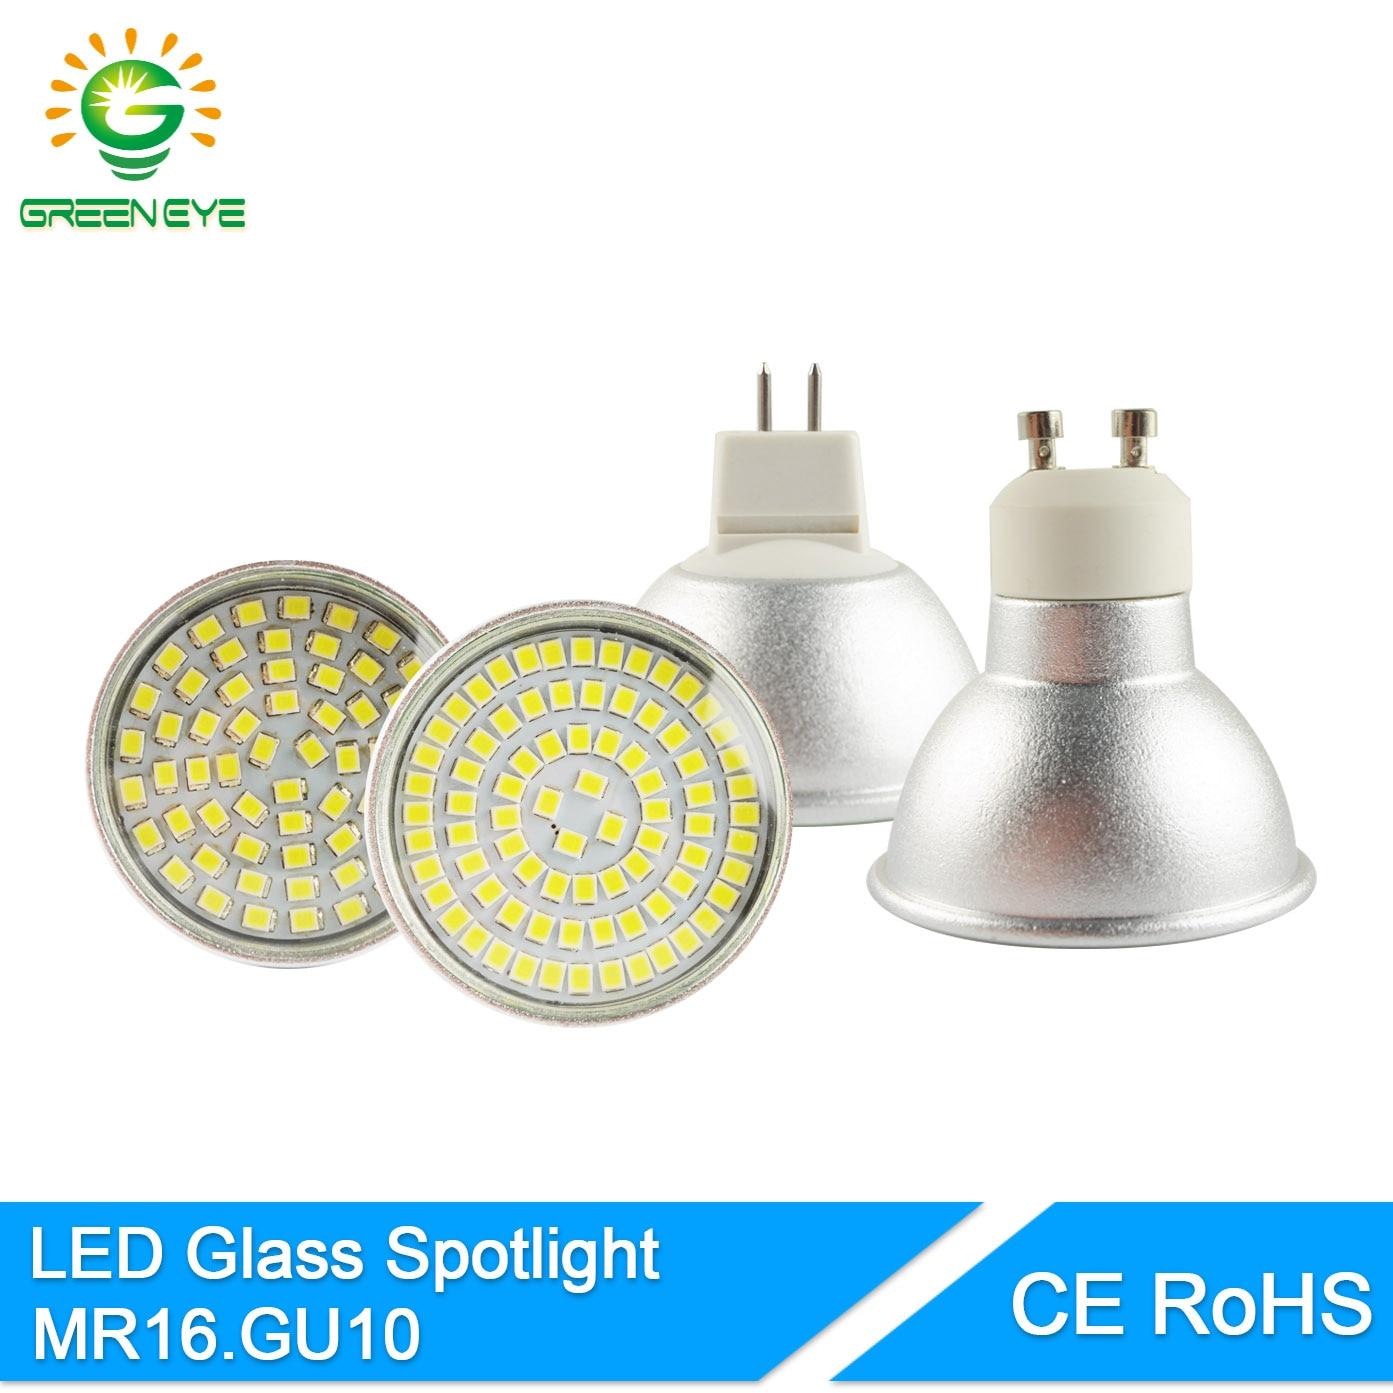 GreenEye-High-Bright-Glass-Aluminum-font-b-MR16-b-font-GU10-font-b-LED-b-font Verwunderlich Gu 5.3 Led 230v Dekorationen